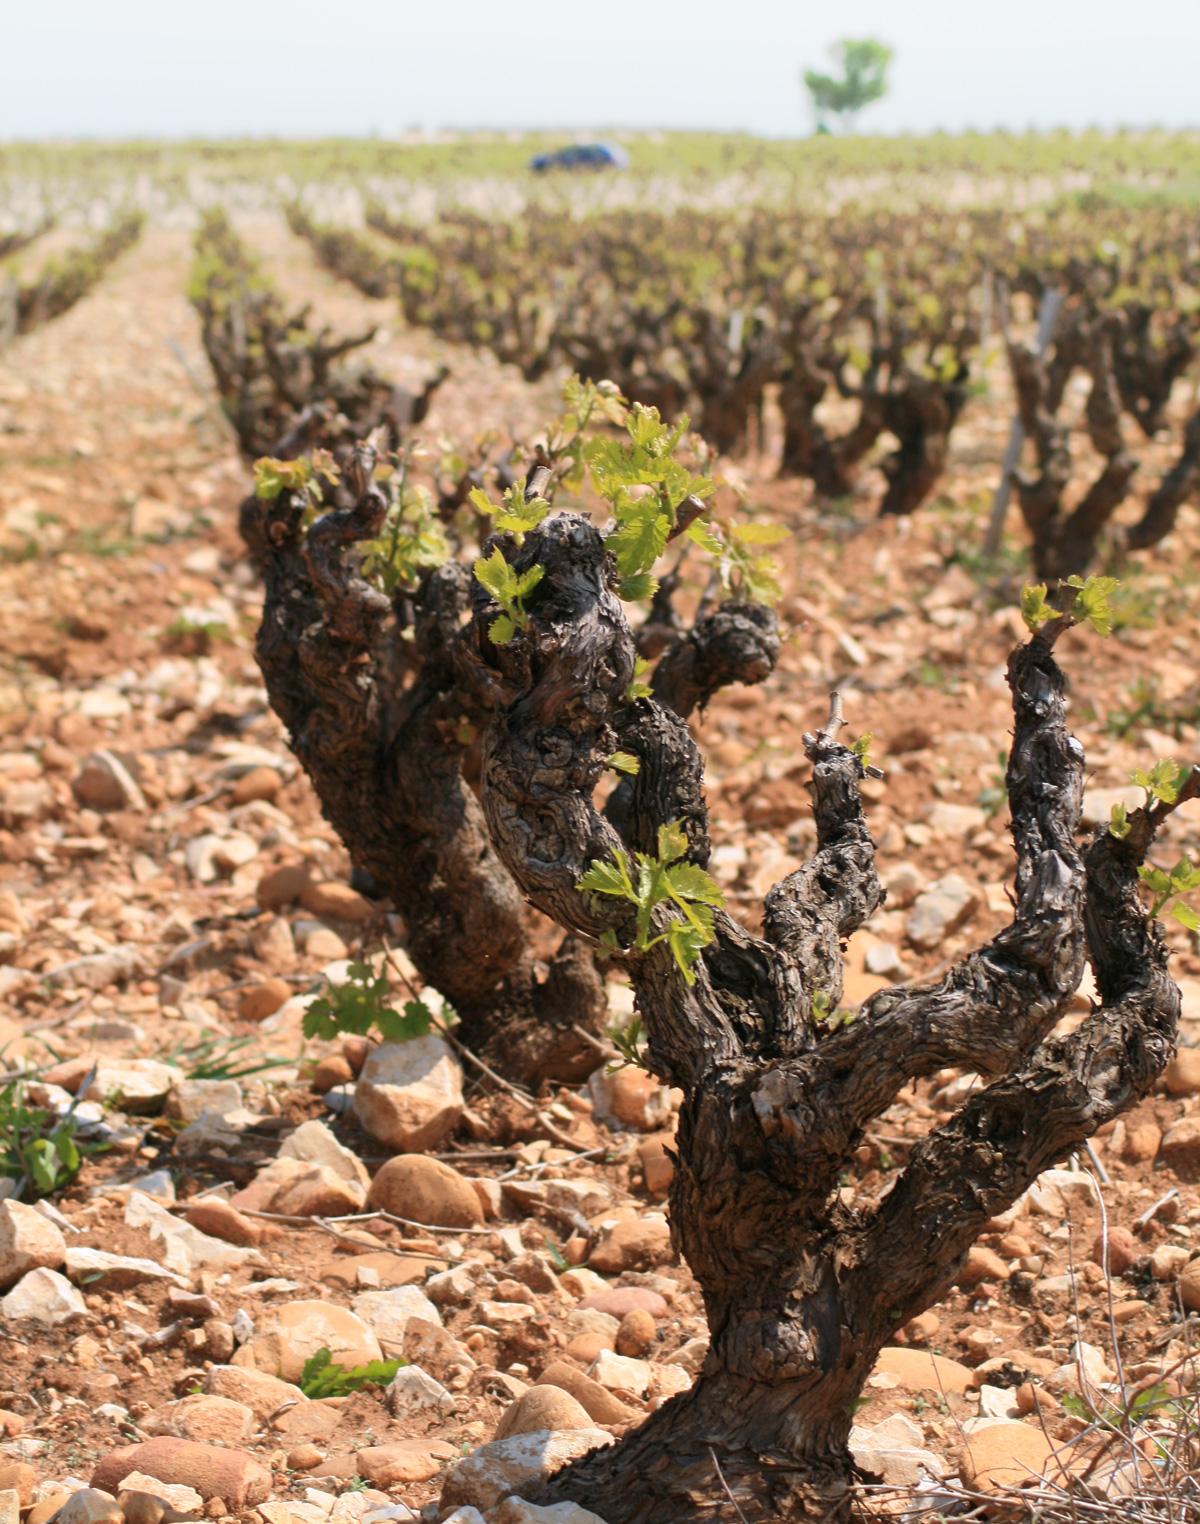 jean-louis_zimmerman-chateauneuf-du-pape-vineyards-2009